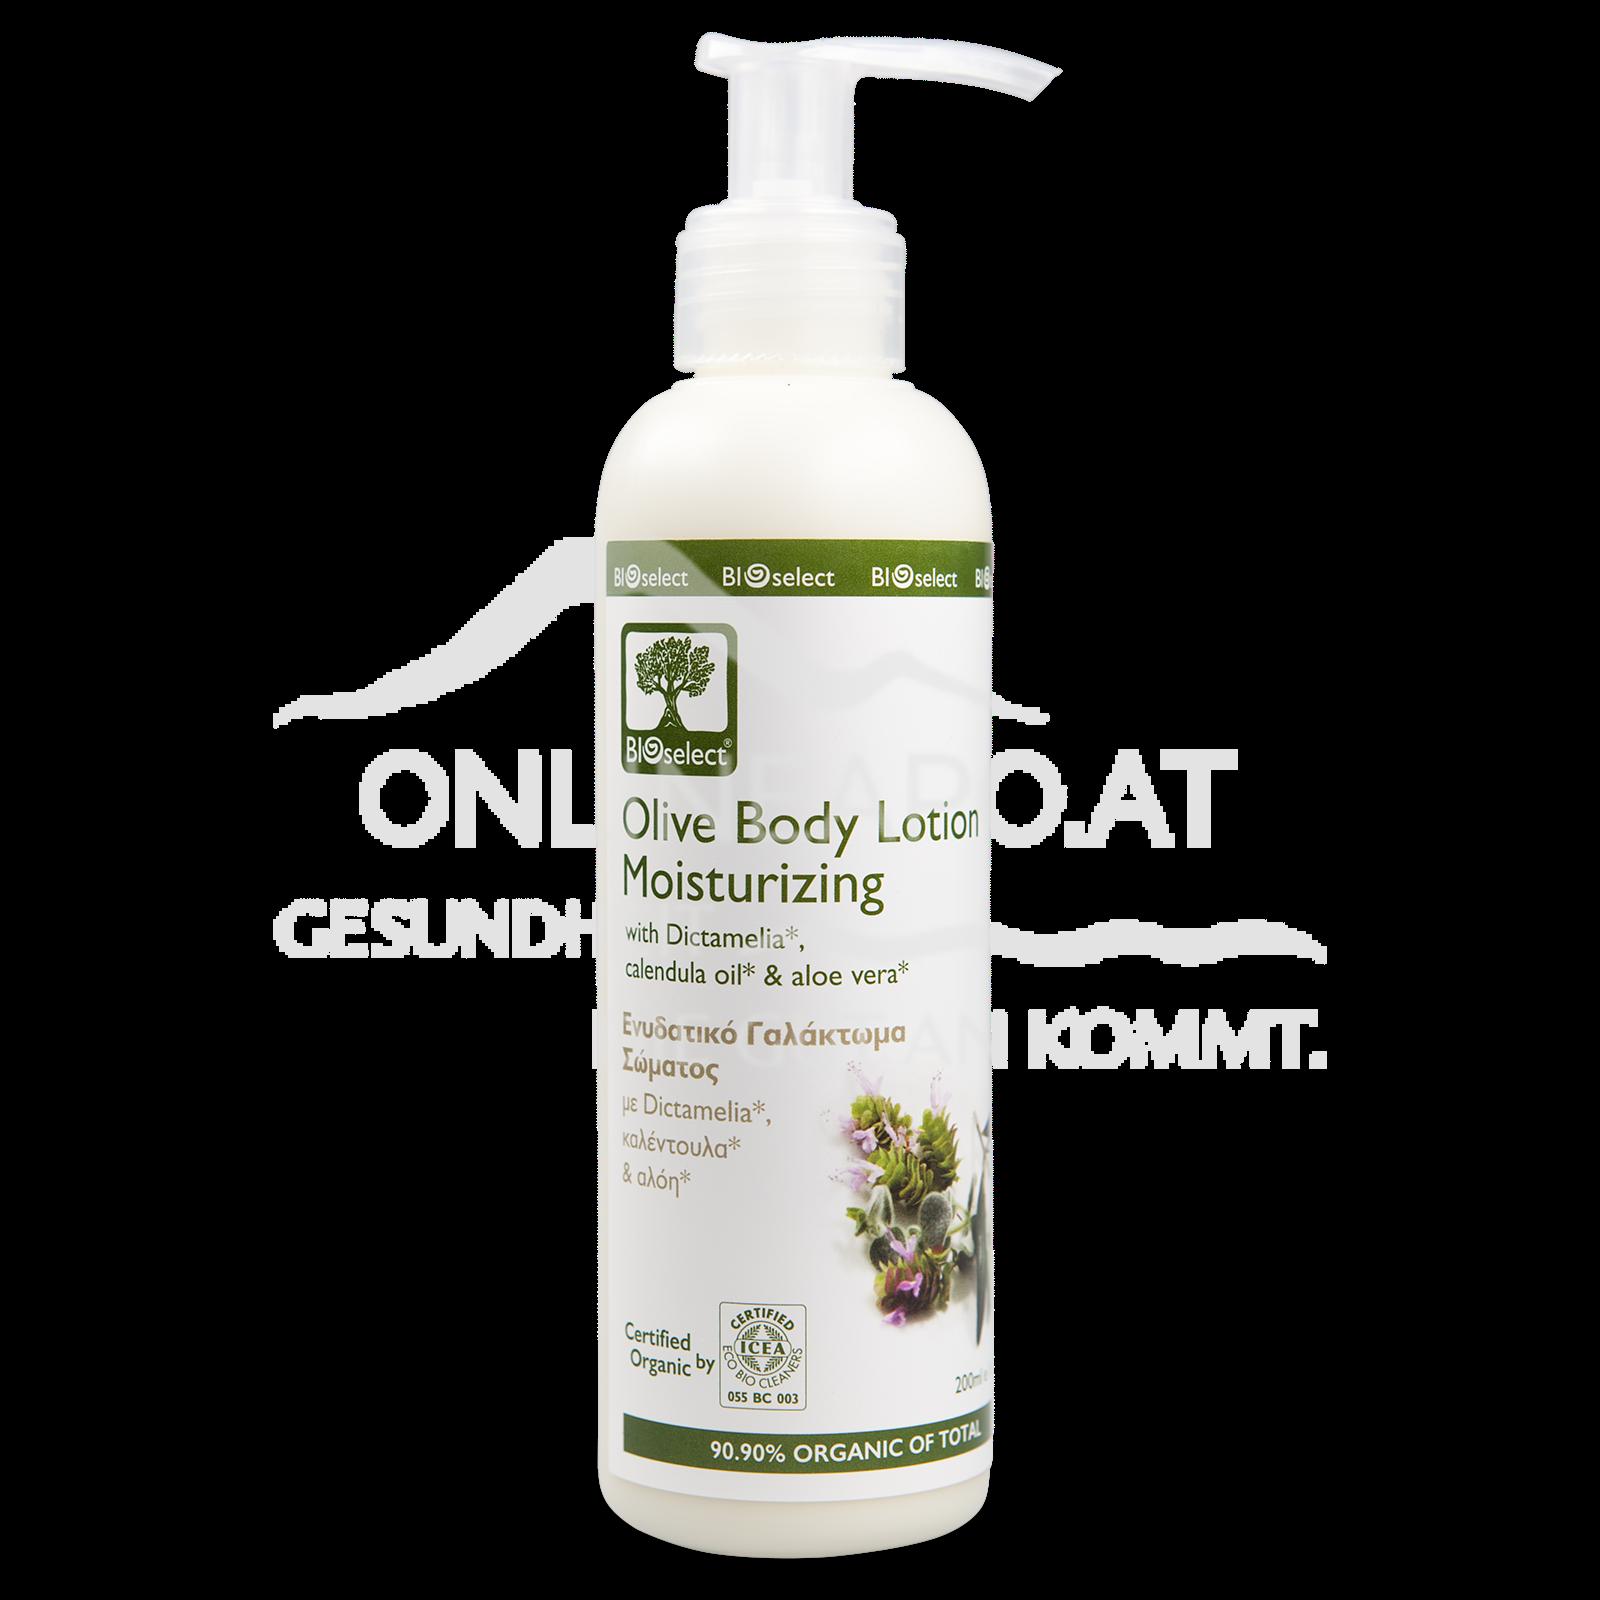 Bioselect Olive Body Lotion Moisturizing